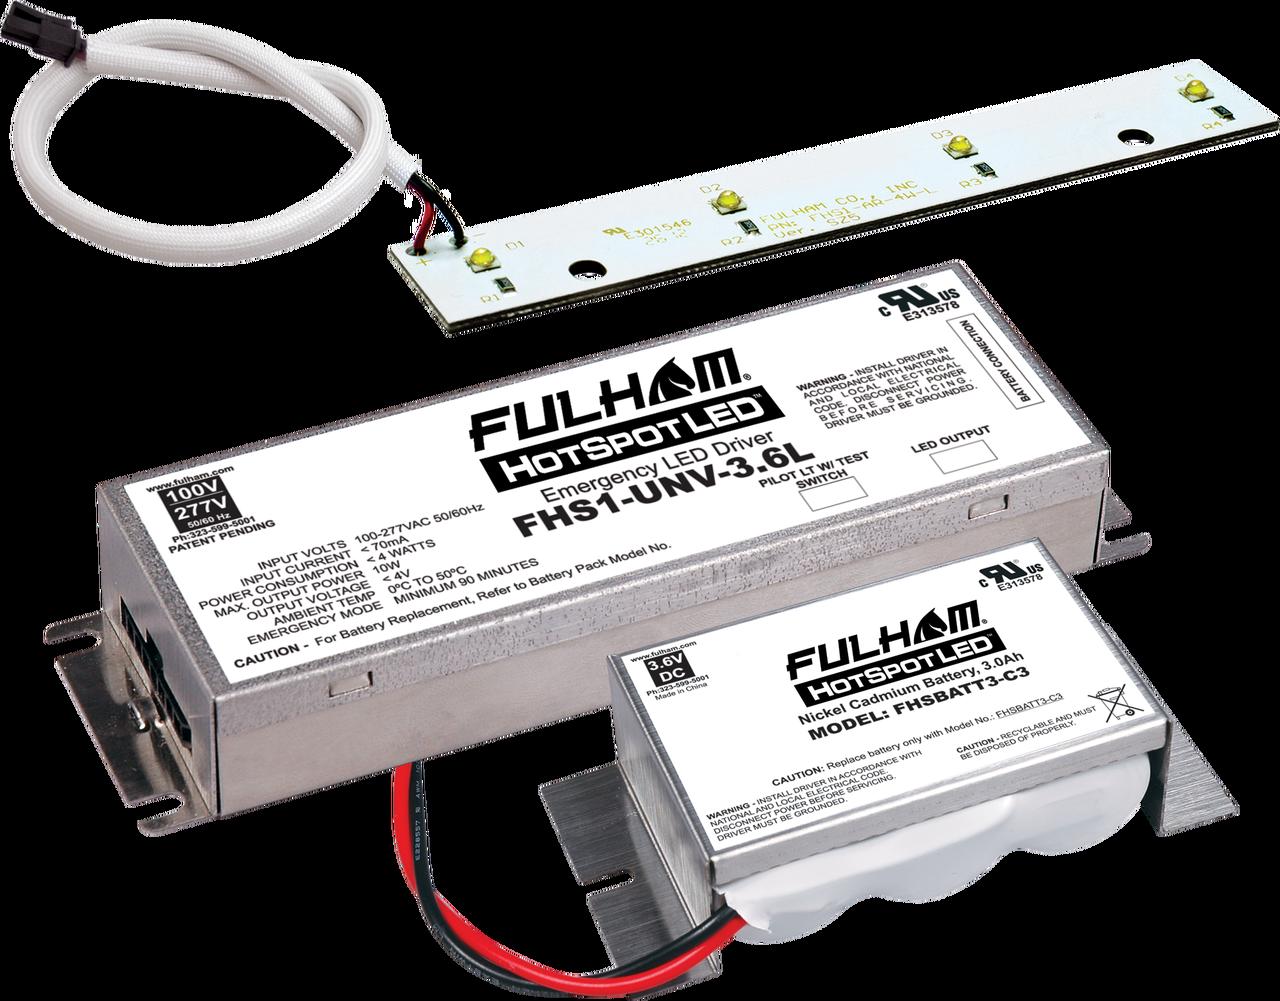 Fulham Hotspot1 1linear Array Emergency Lighting Kit 4w Fluorescent Lamp Driver Fulhamfhskitt04lnc